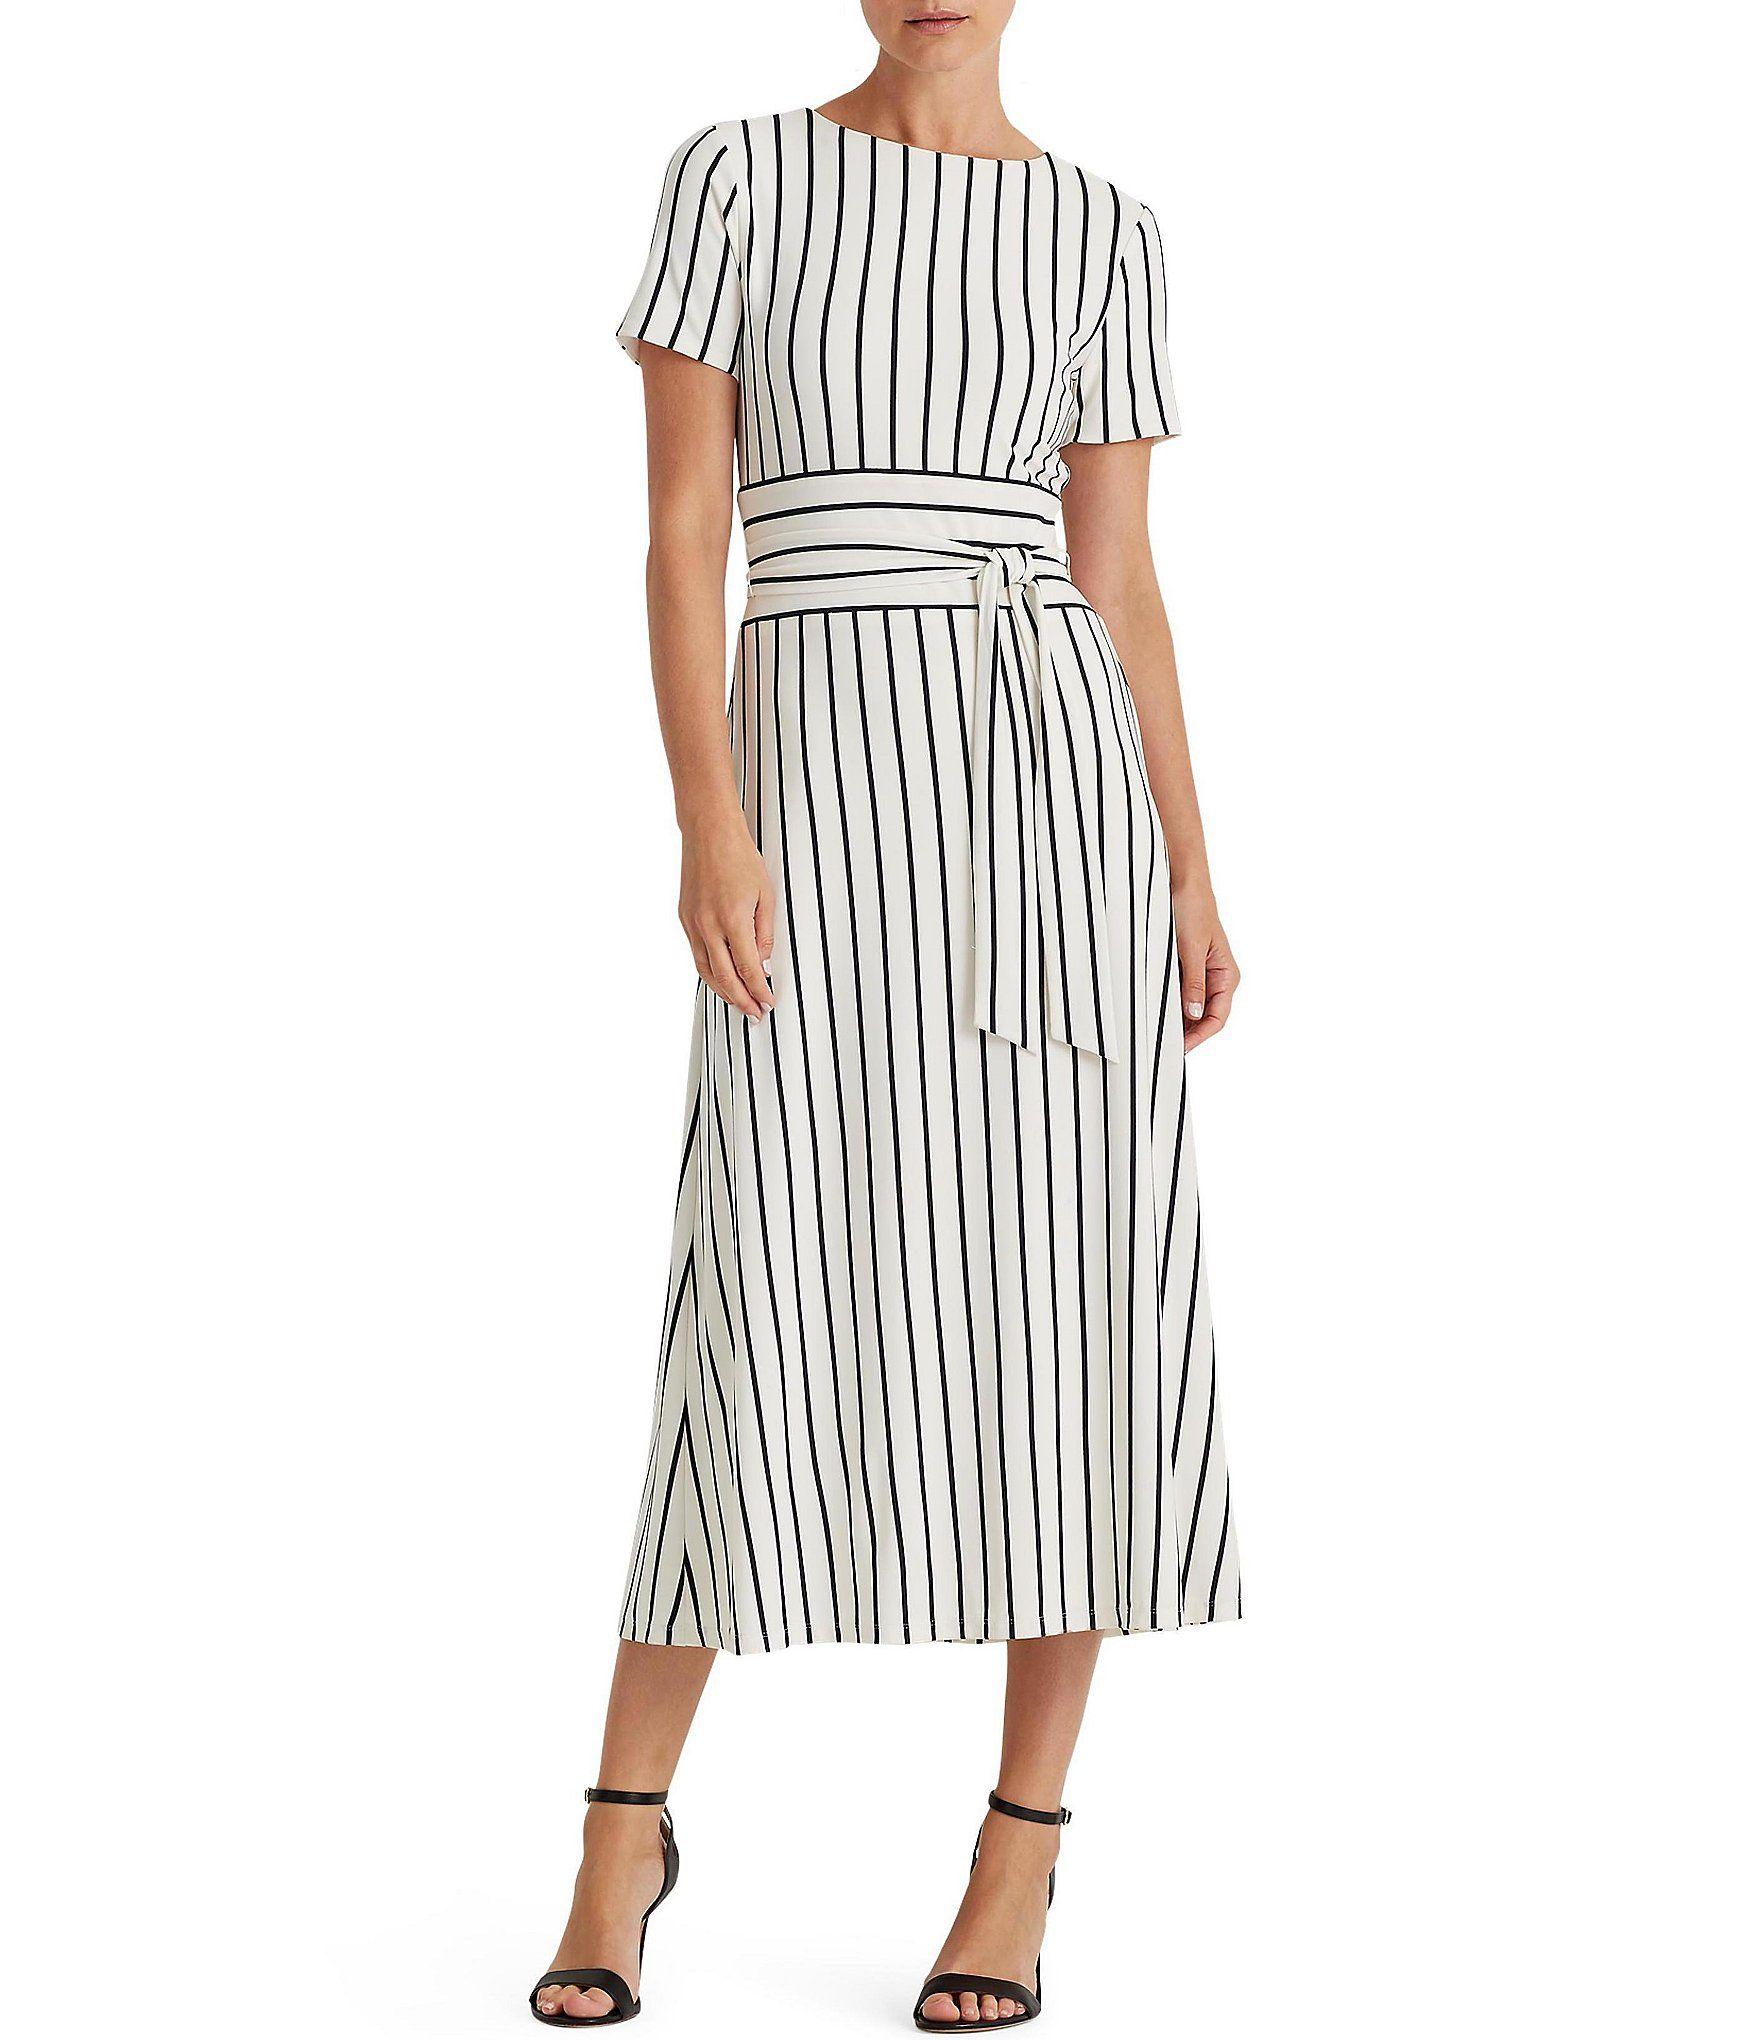 Lauren Ralph Lauren Kristie Stripe Print Matte Jersey Short Sleeve Tie Waist Dress | Dillard's